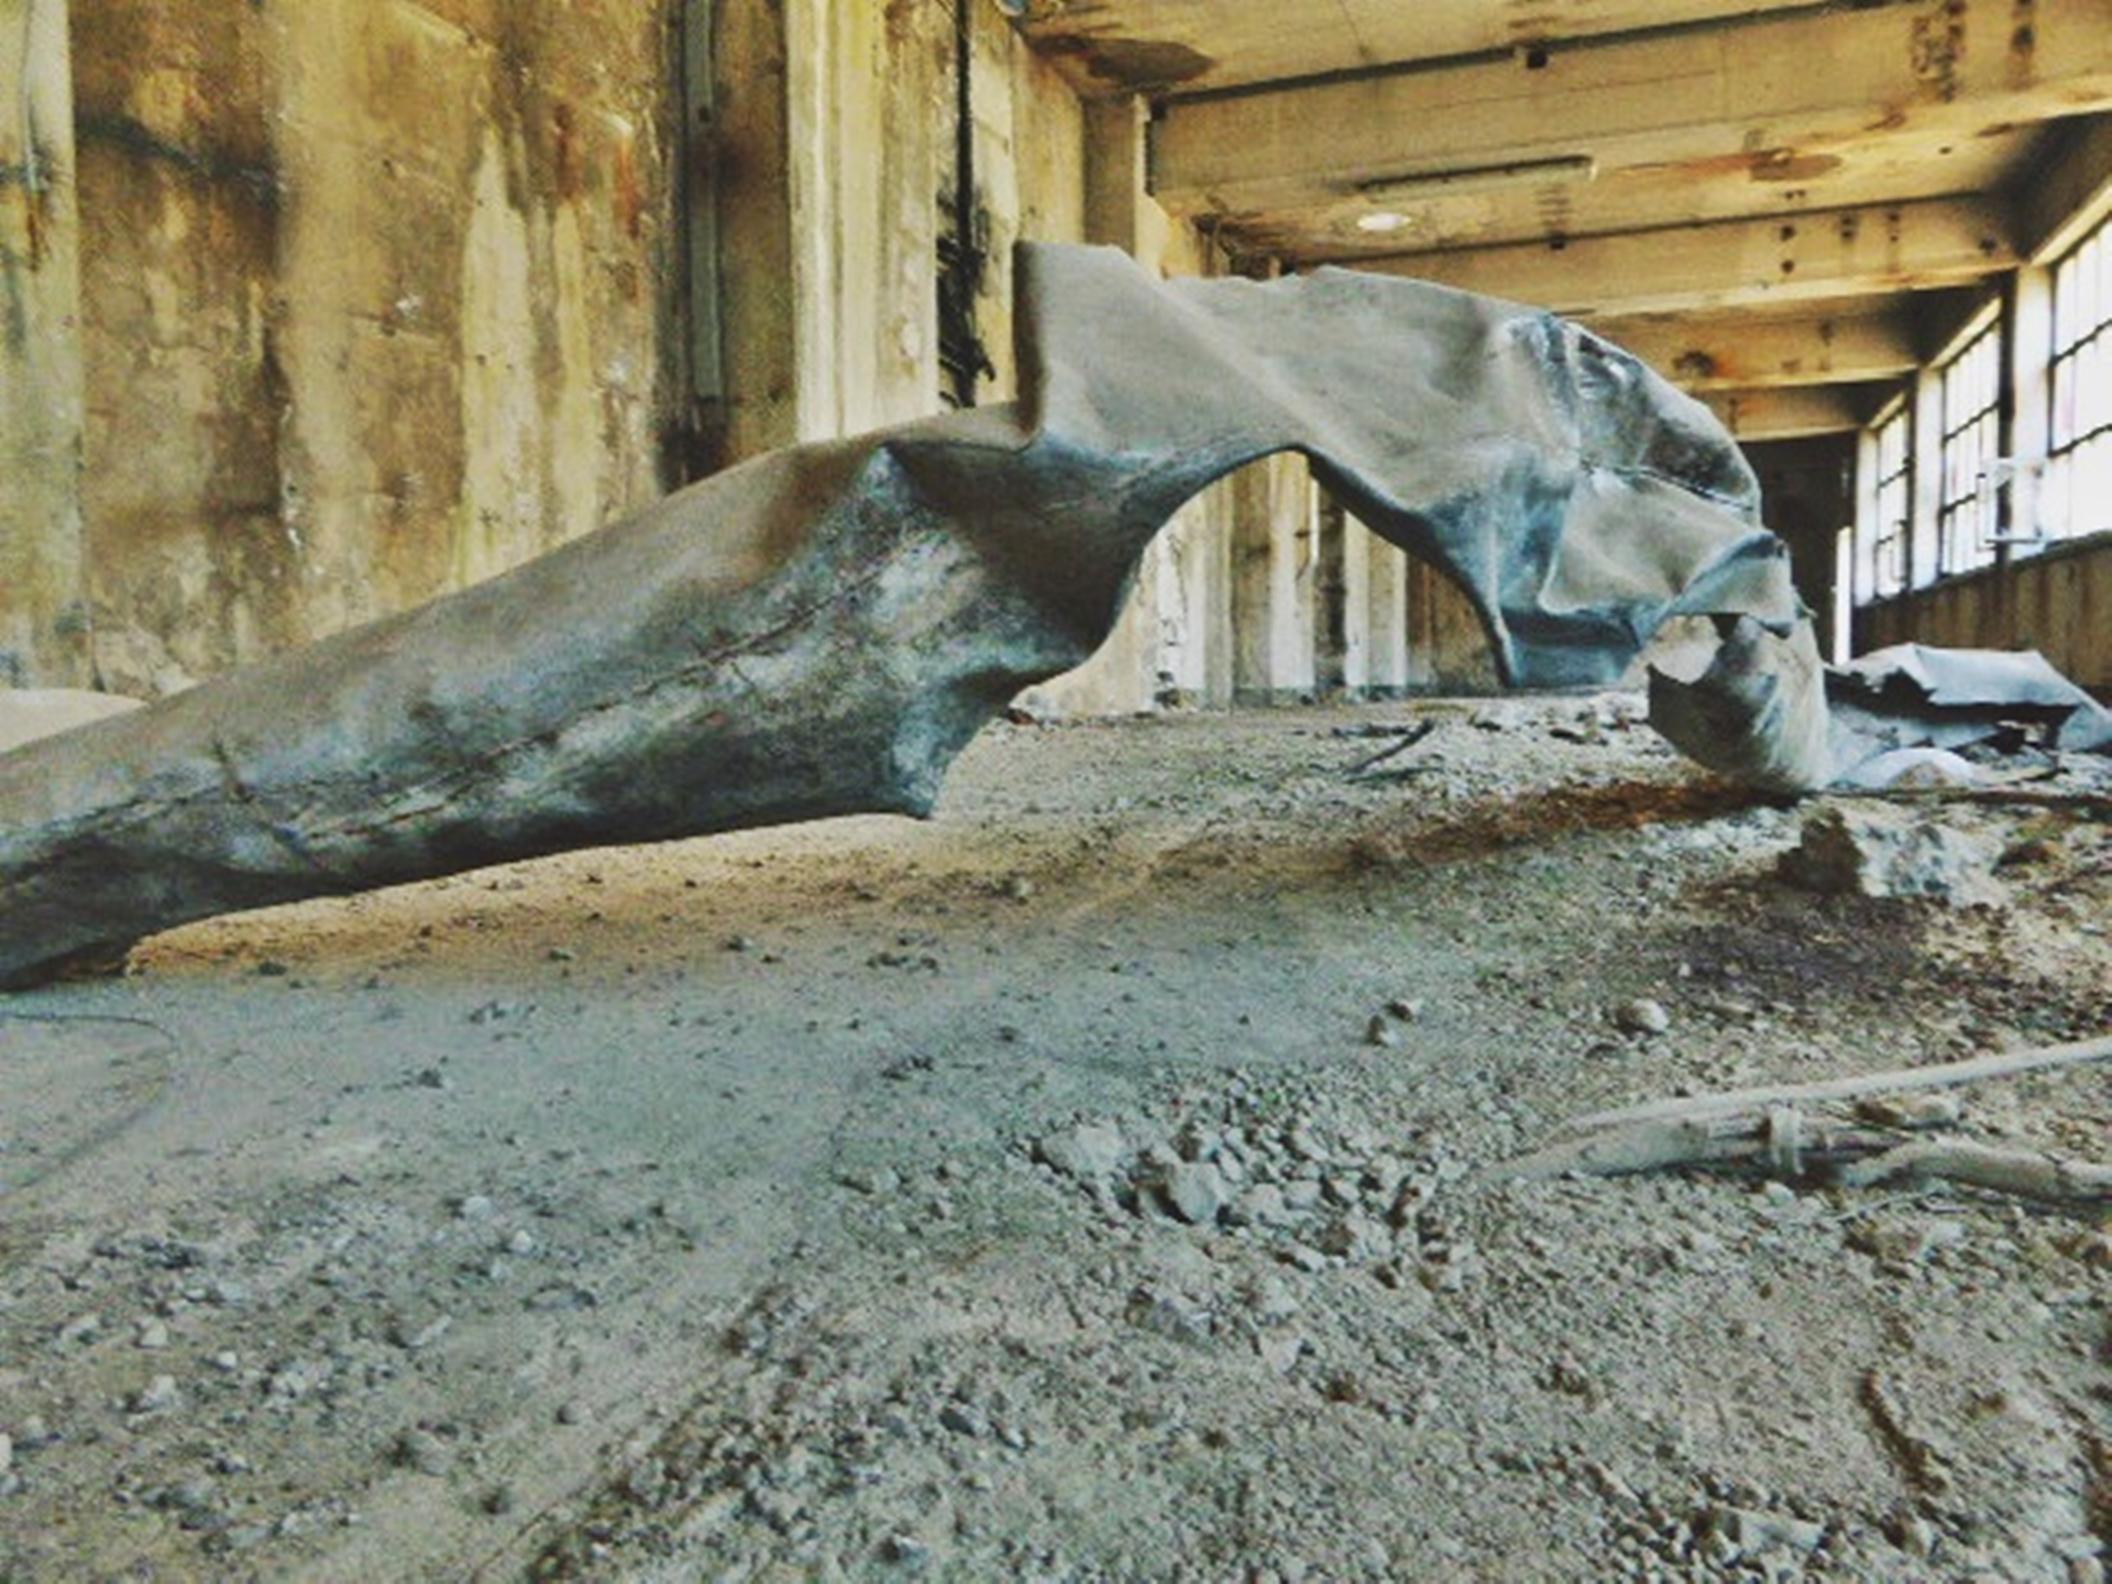 File:Pedro Meier Skulptur, Zyklus »Almost Readymade Nr. 07« 2016,  (Eisenblech patiniert, Objets trouvés). Skulpturenpark Art Campus Attisholz  bei Solothurn, Schweiz. Foto © Pedro Meier Multimedia Artist.jpg -  Wikimedia Commons